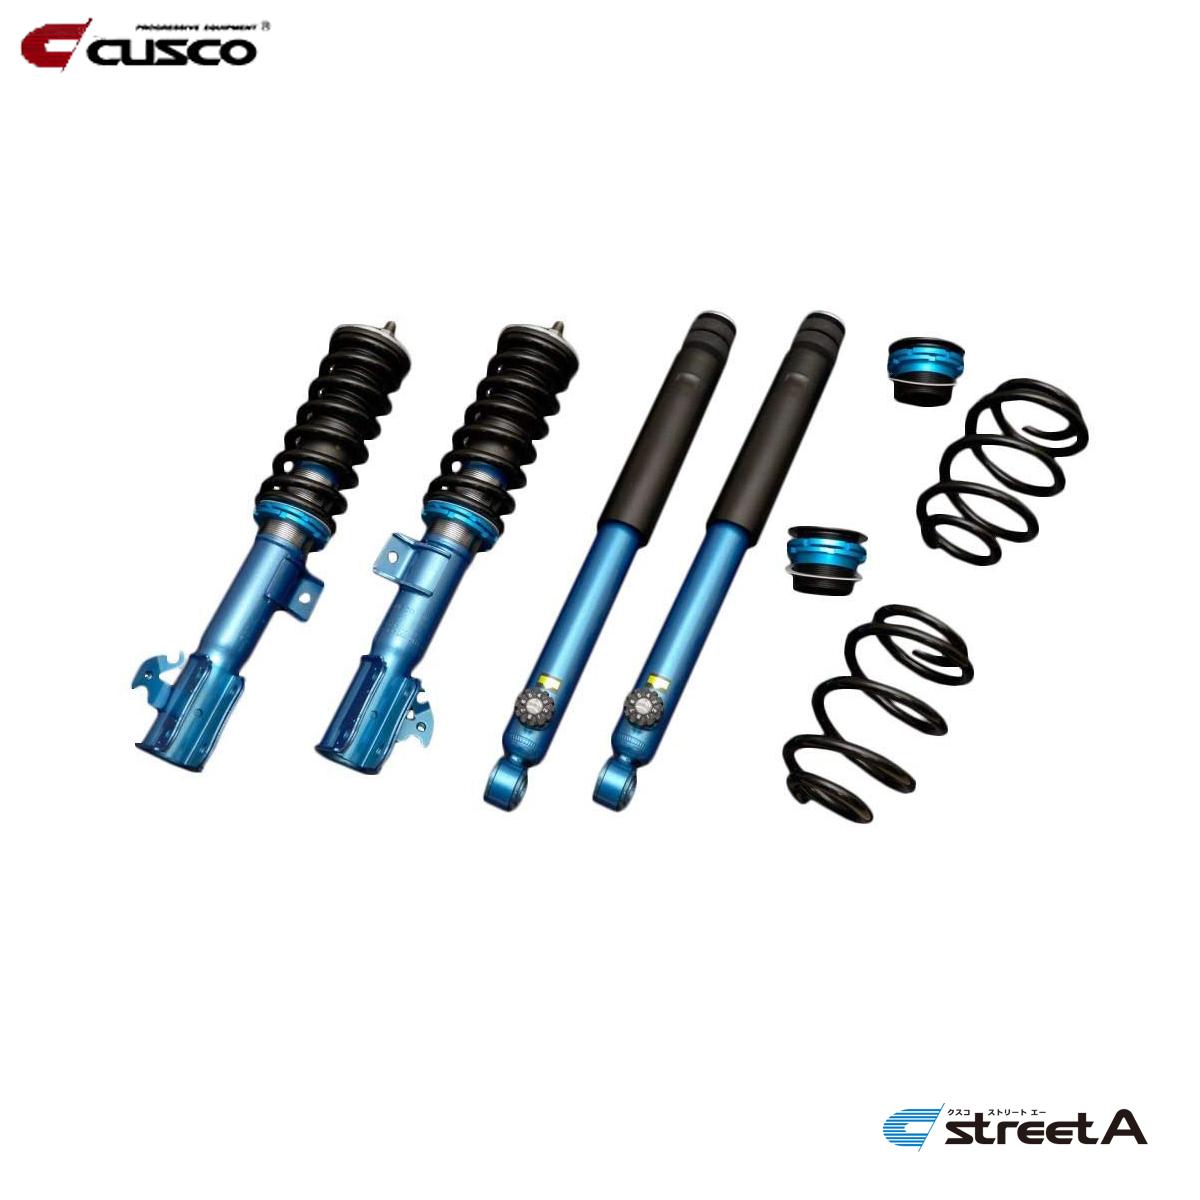 CUSCO クスコ アクセラ BL5FP BLFFP 車高調 全長固定式 471-62J-CBA